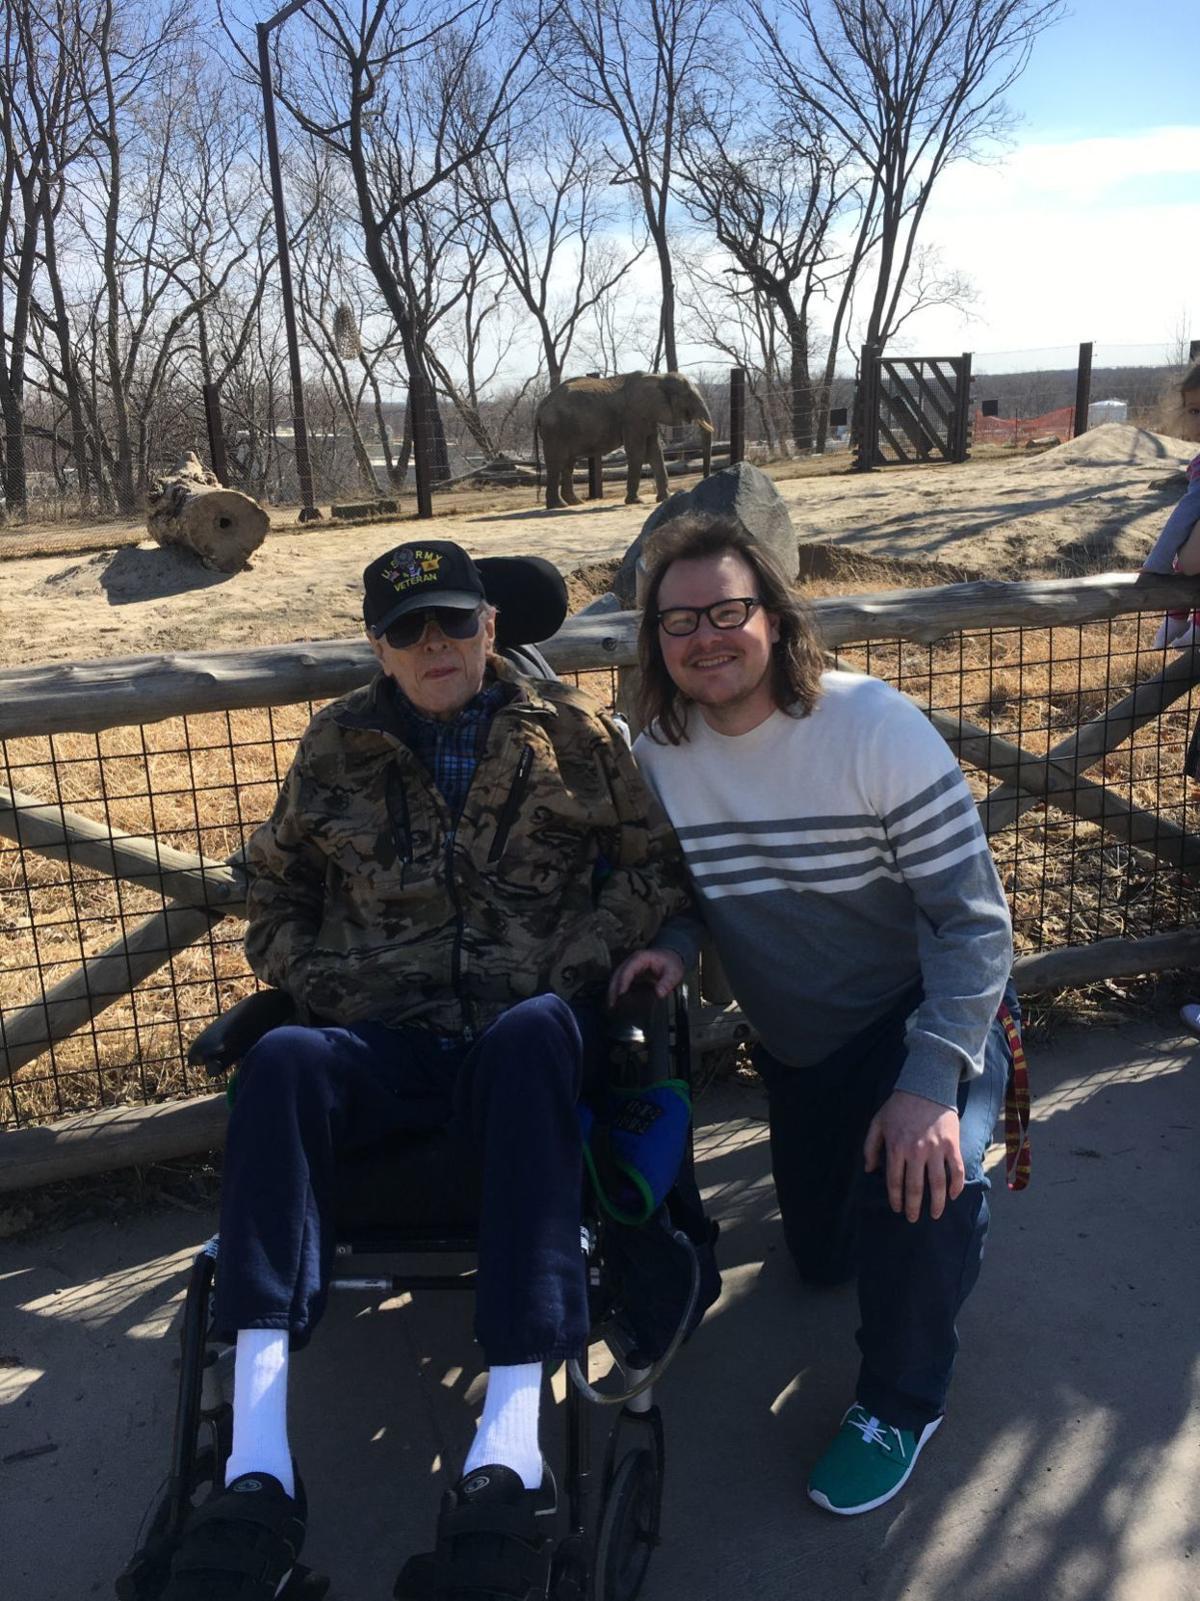 Elephants love reunions: Omaha man memorializes wife through her love for elephants